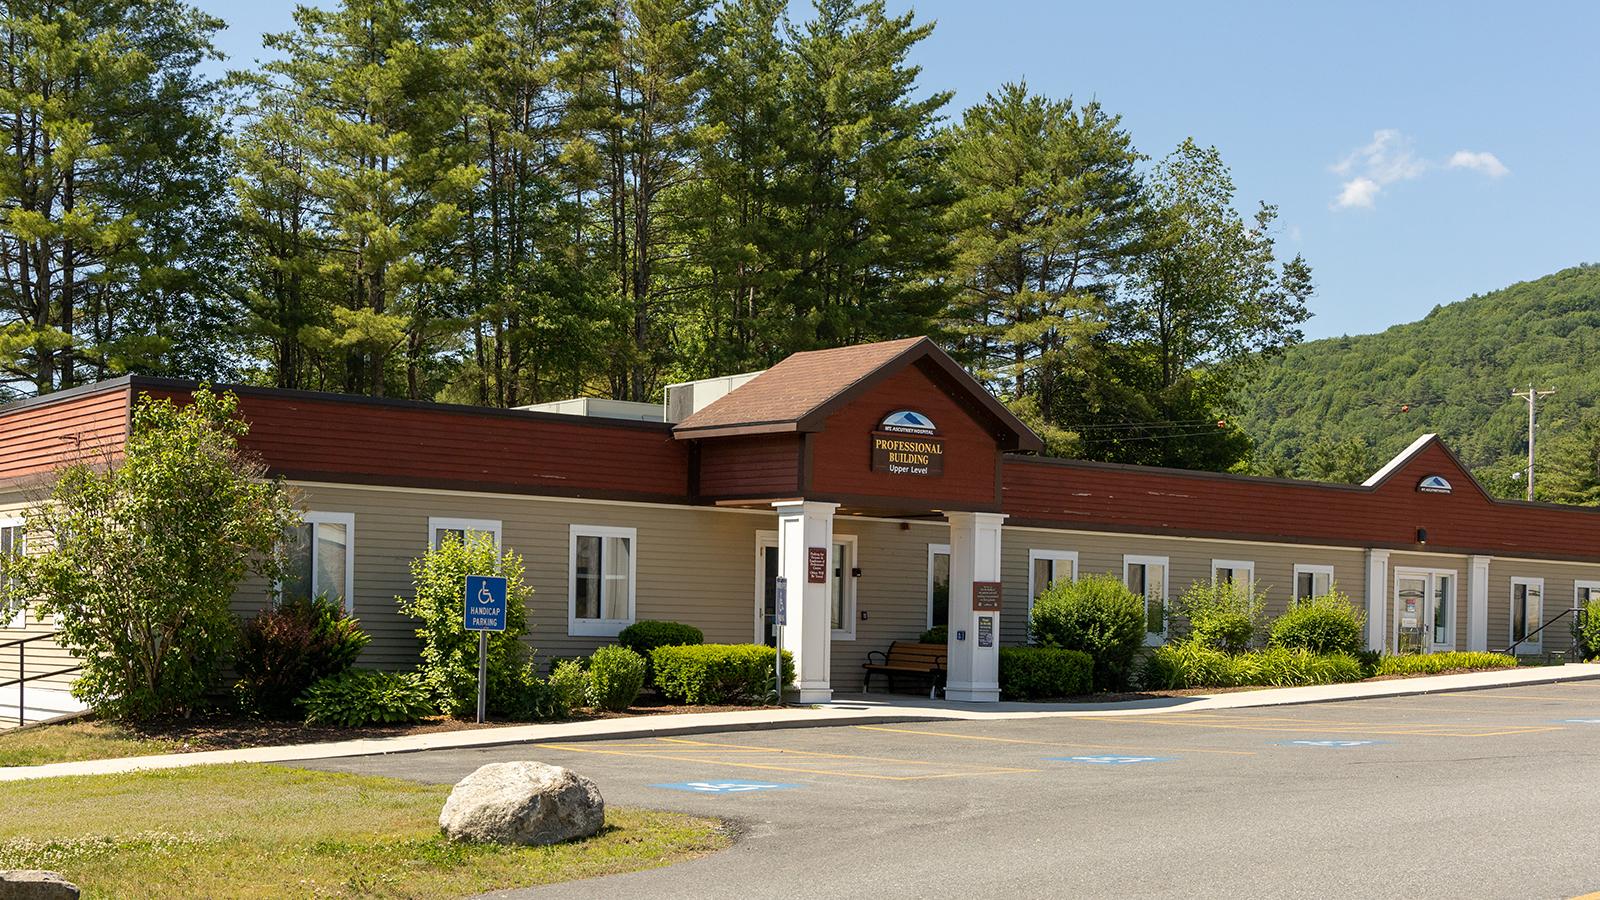 289 County Road, Windsor, Vermont